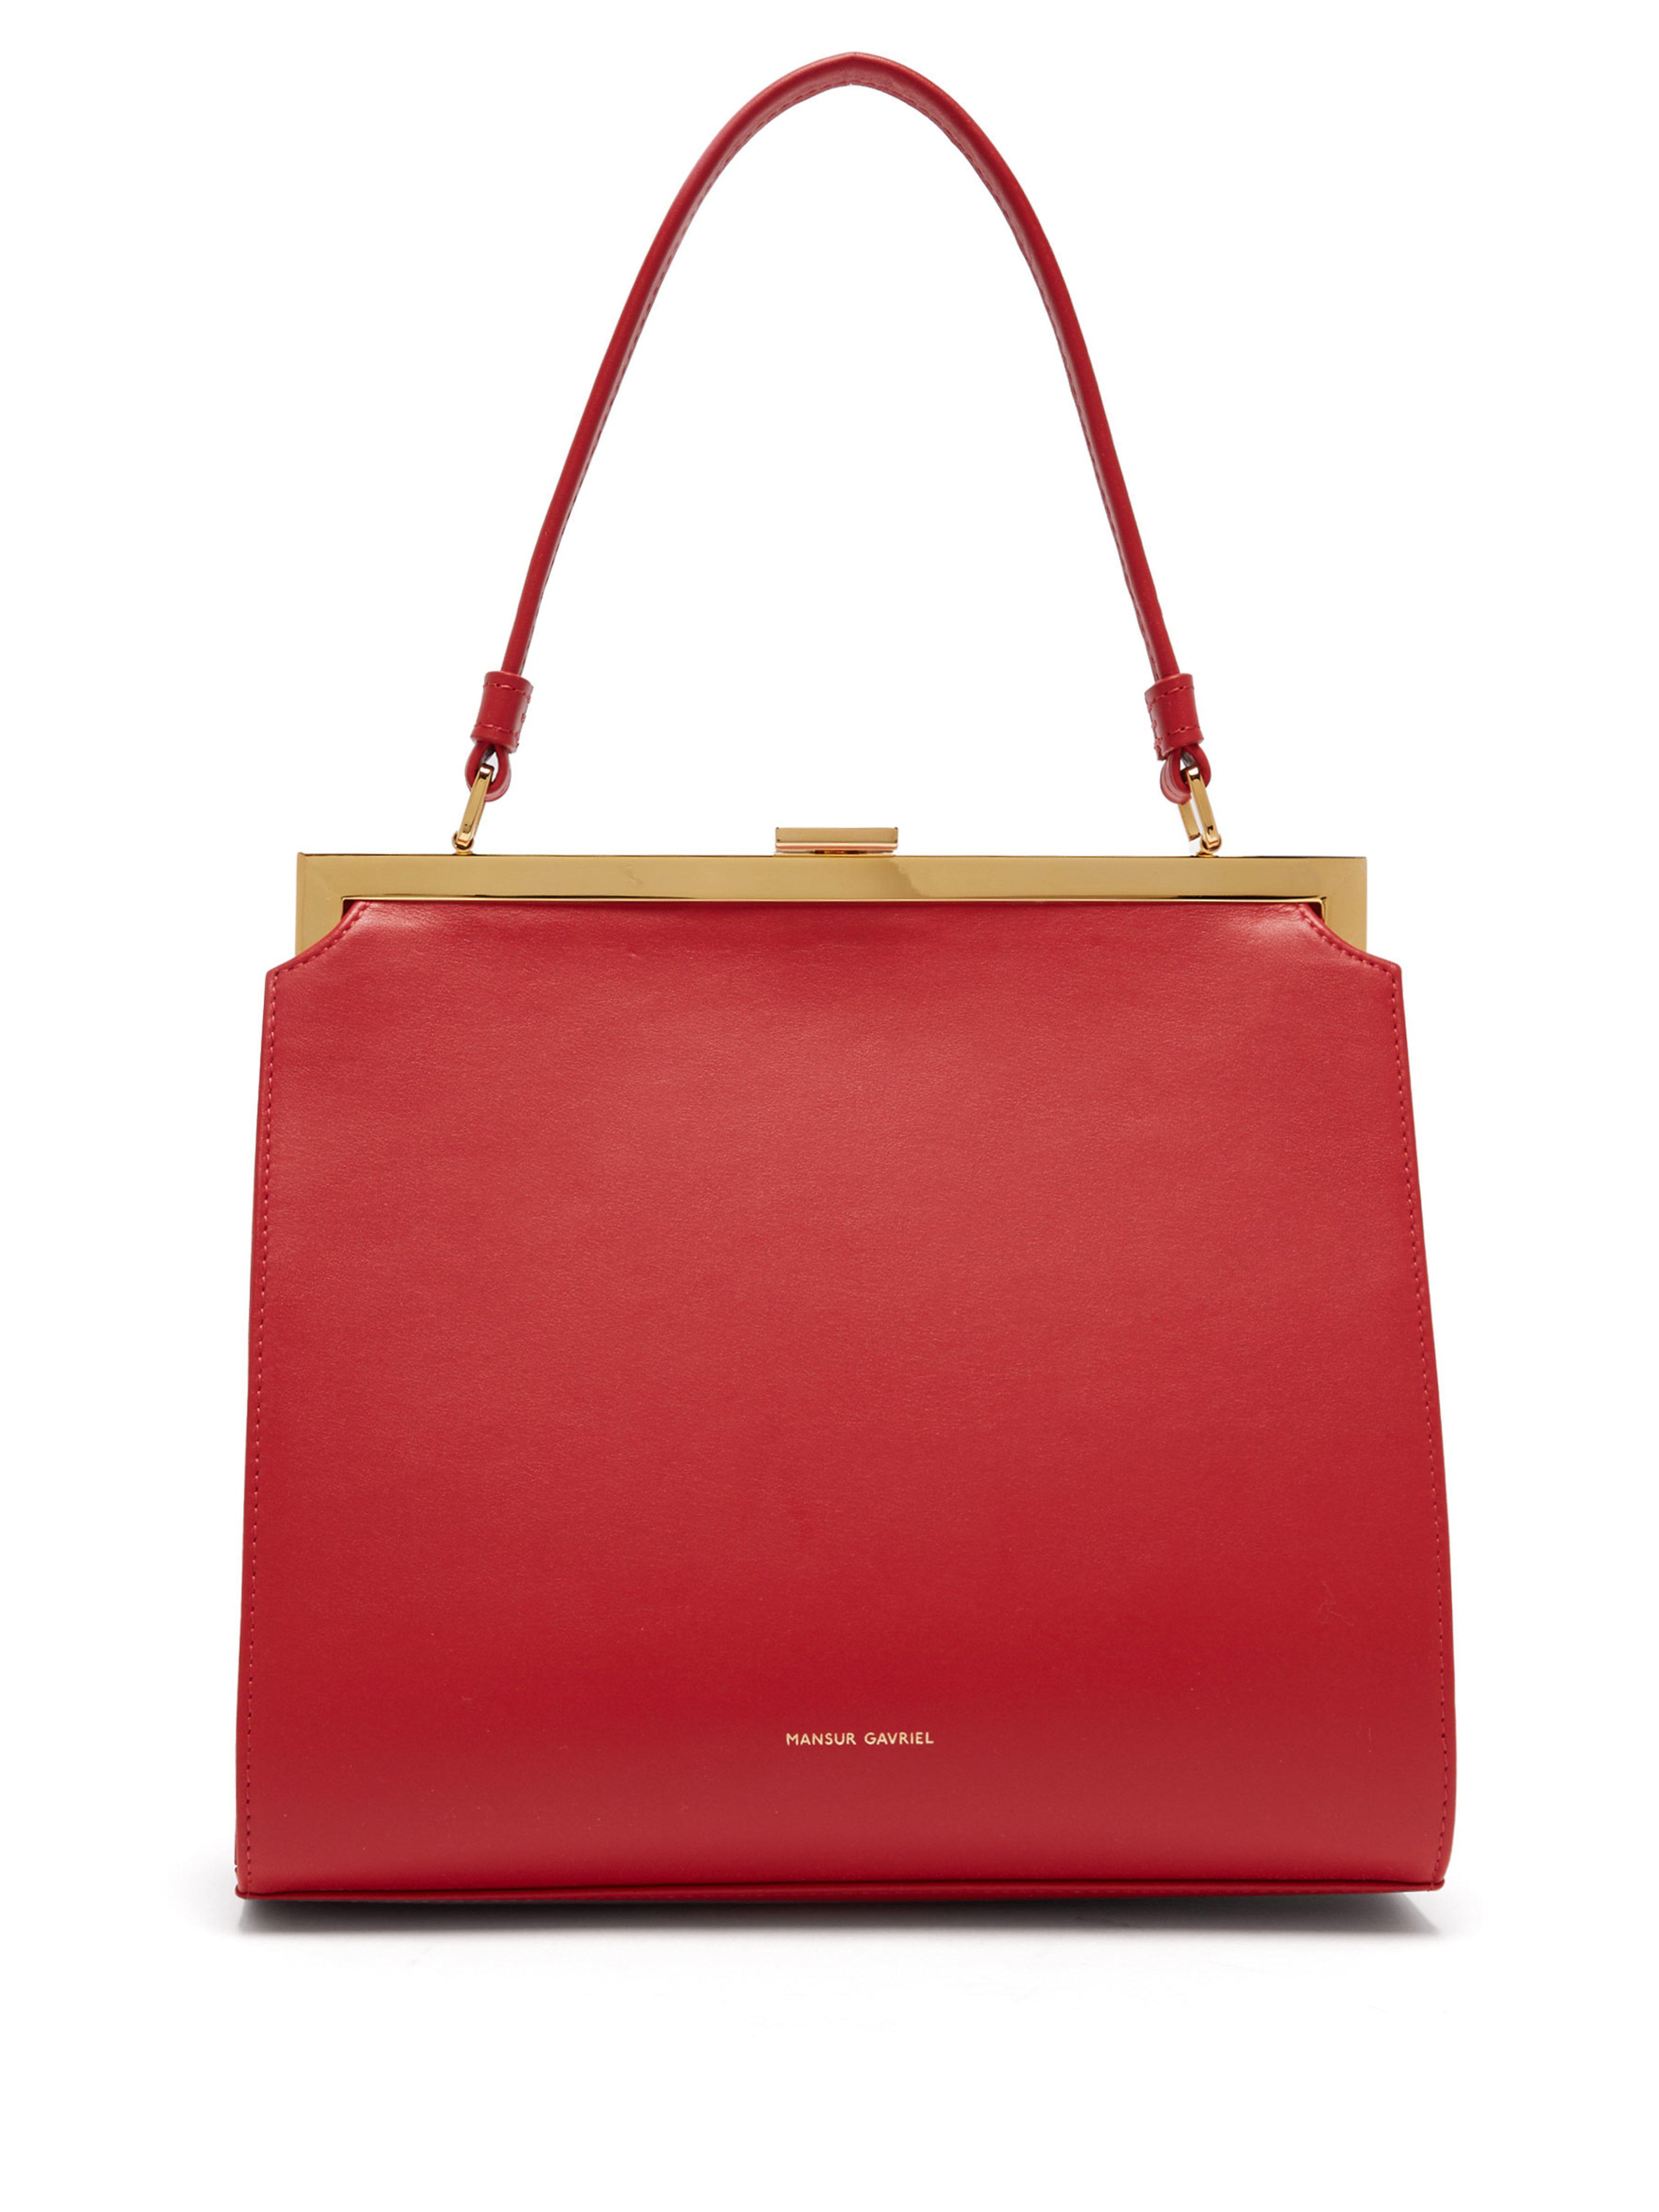 e1aa4685dcec Mansur Gavriel - Red Elegant Leather Bag - Lyst. View fullscreen